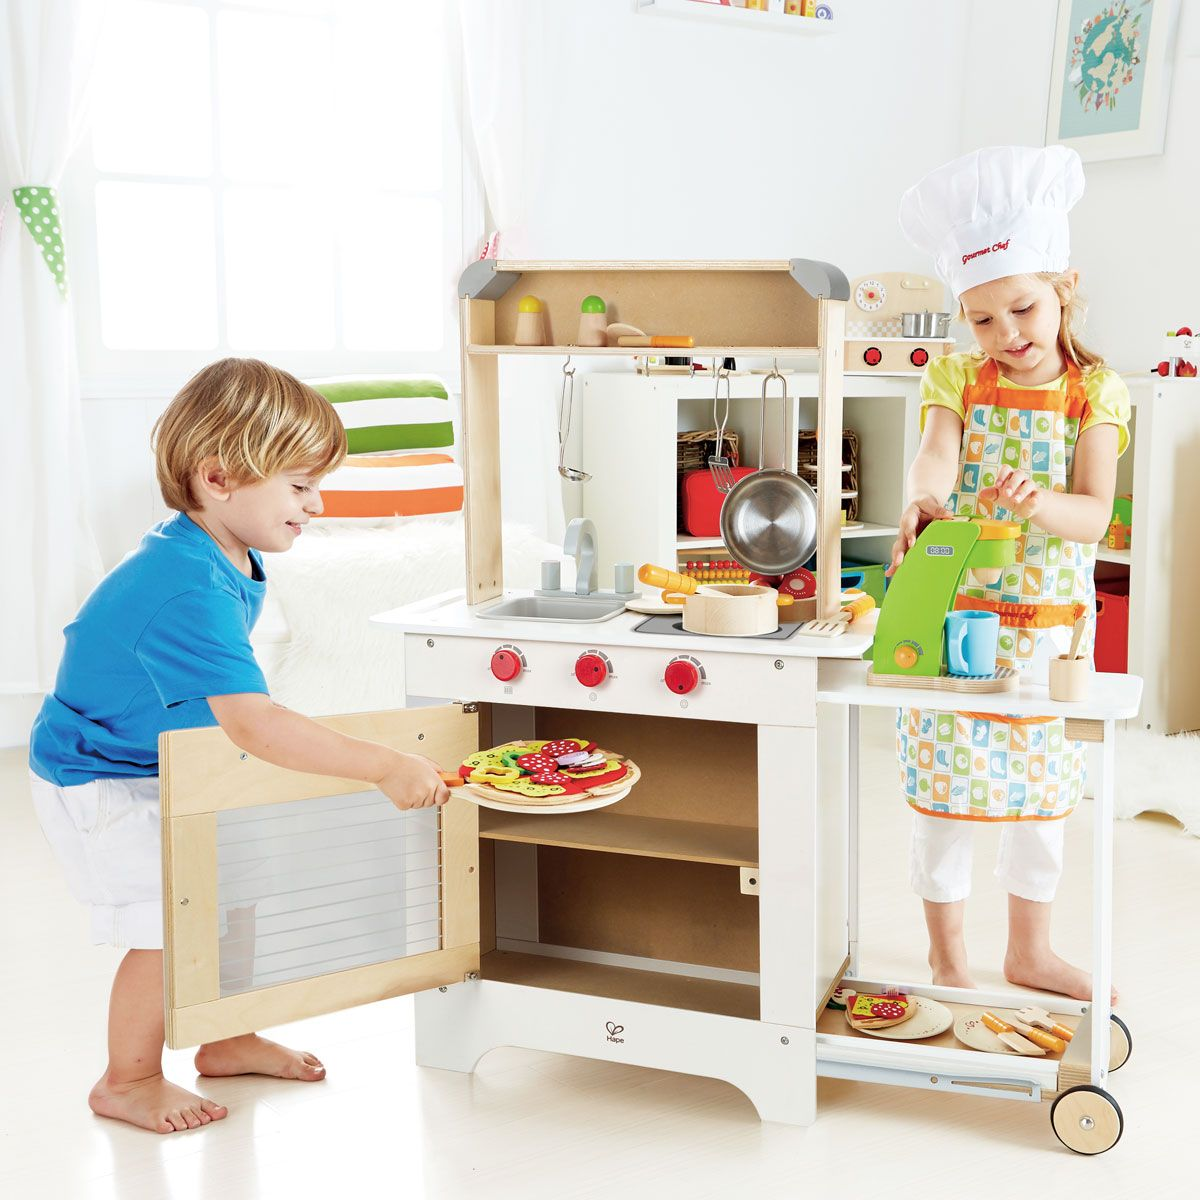 E3126_AllInOne05.jpg (1200×1200) | Little kitchen | Pinterest